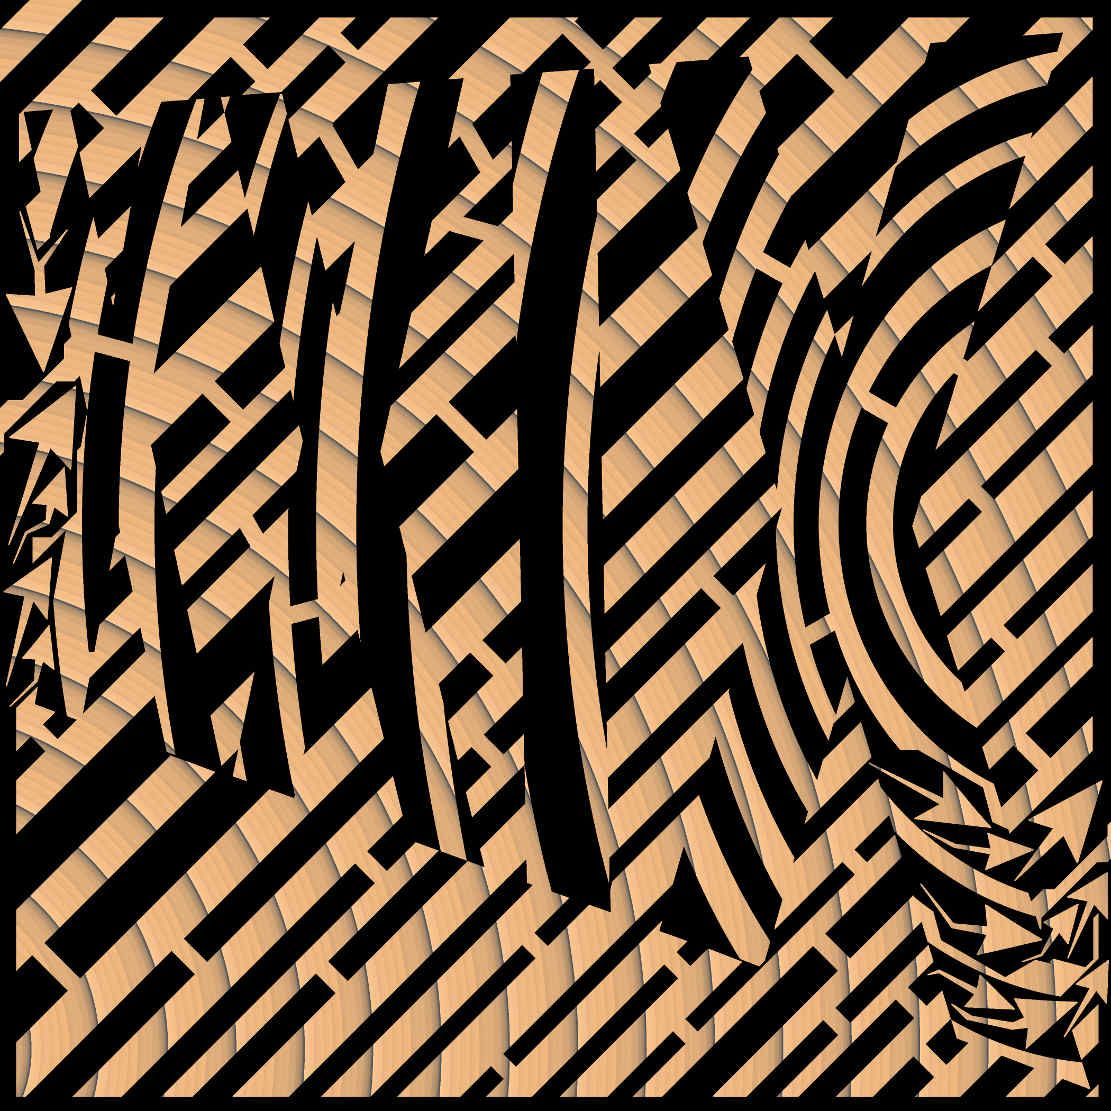 Maze Of Roman Numeral 29 As Xxix